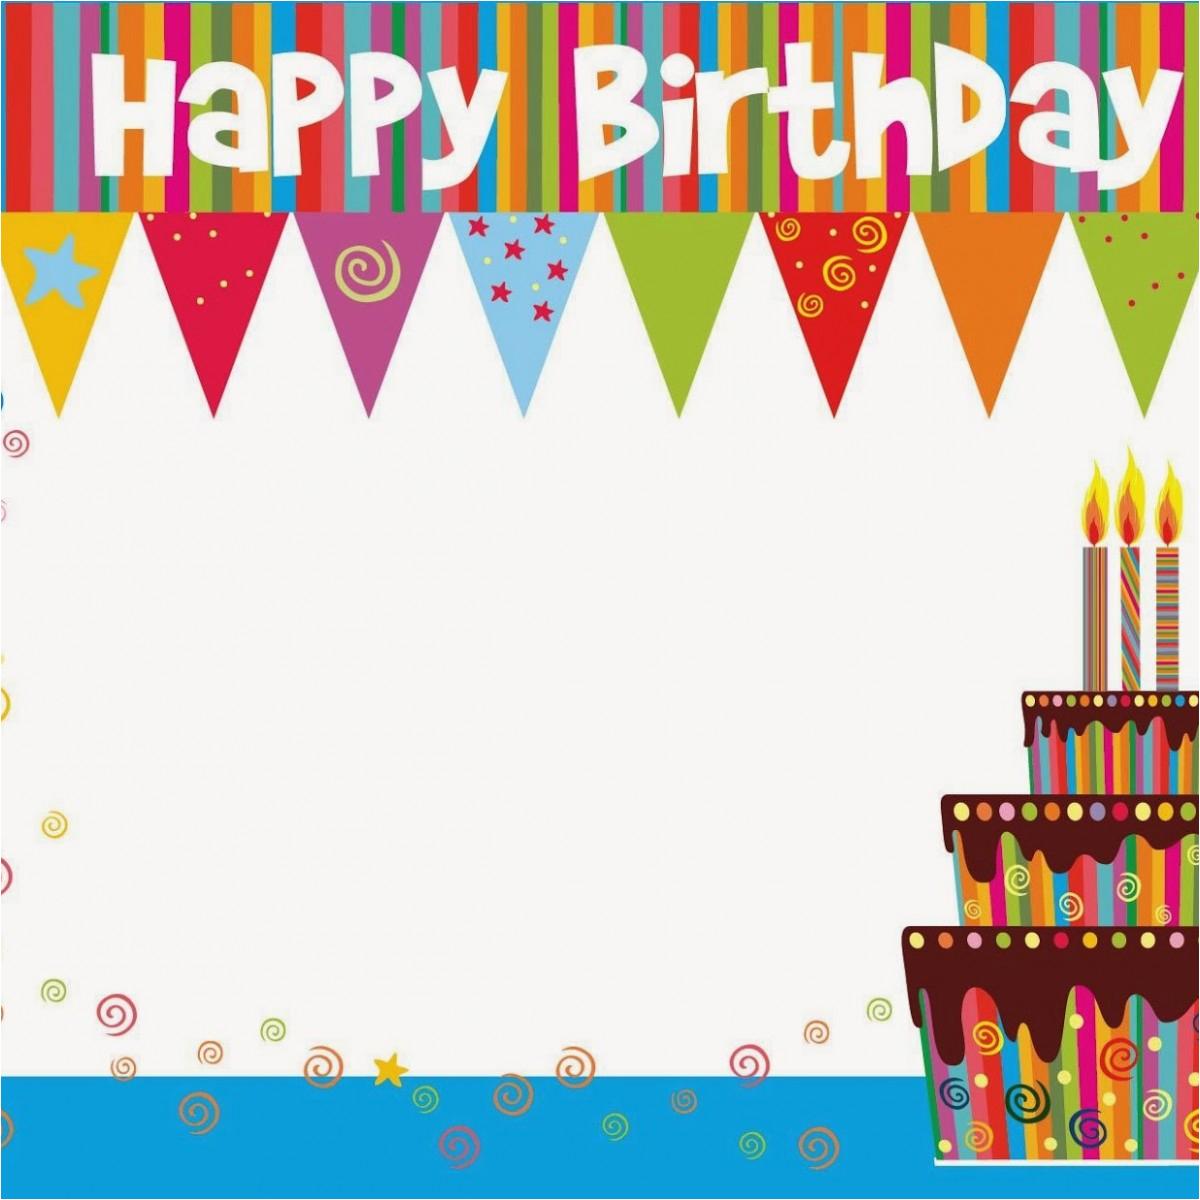 send birthday card online